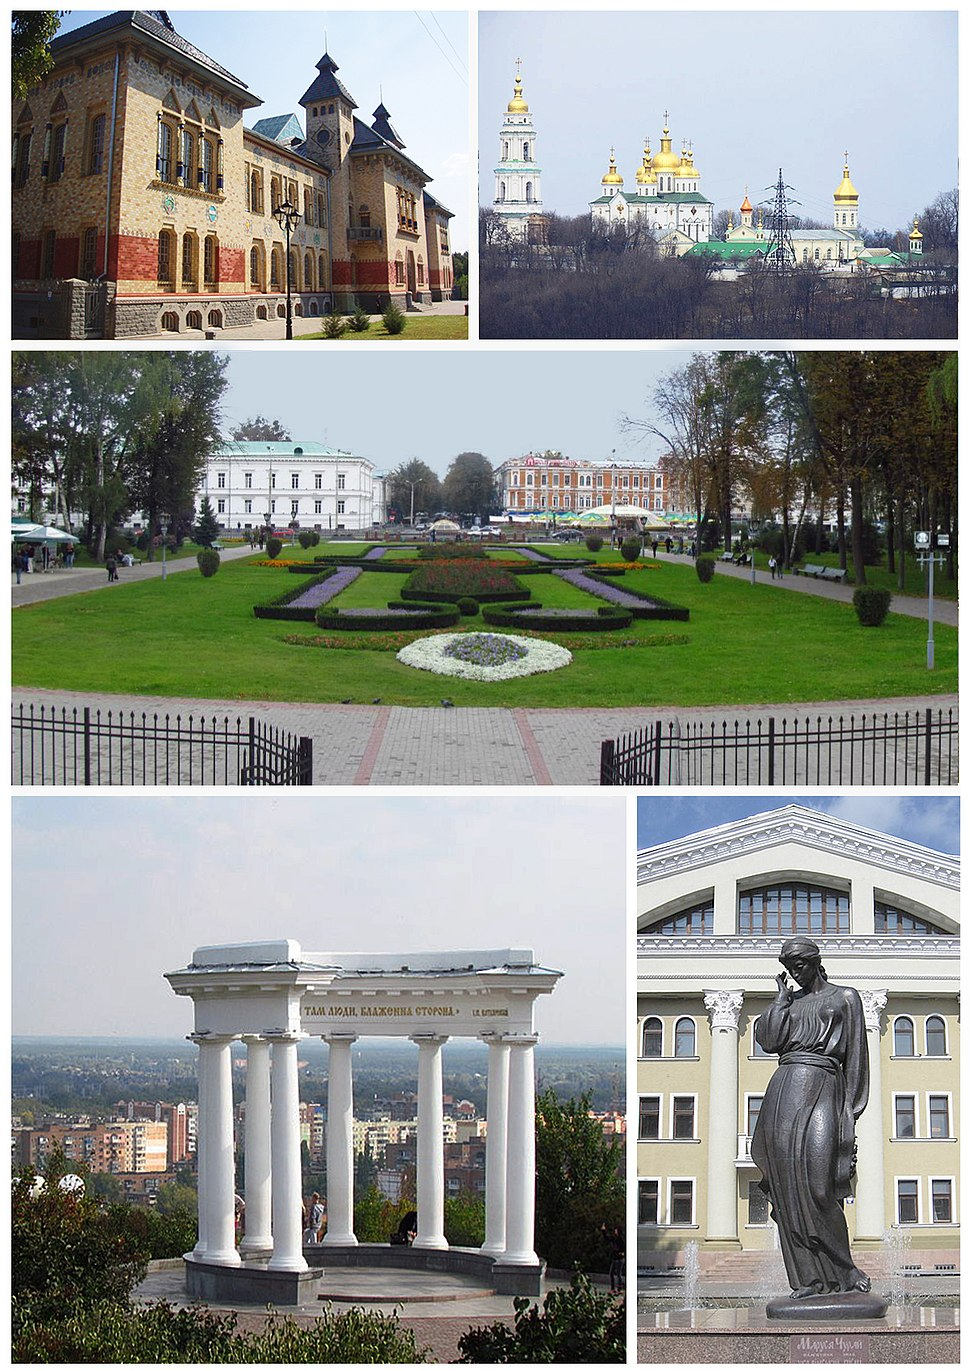 Top left:Poltava Regional Museum, Top right:Poltava Holy Cross Monastery, Center:The Round Square, Bottom left:The White Arbor, Bottom right:Marusia Churai Memorial in Gogolya Street